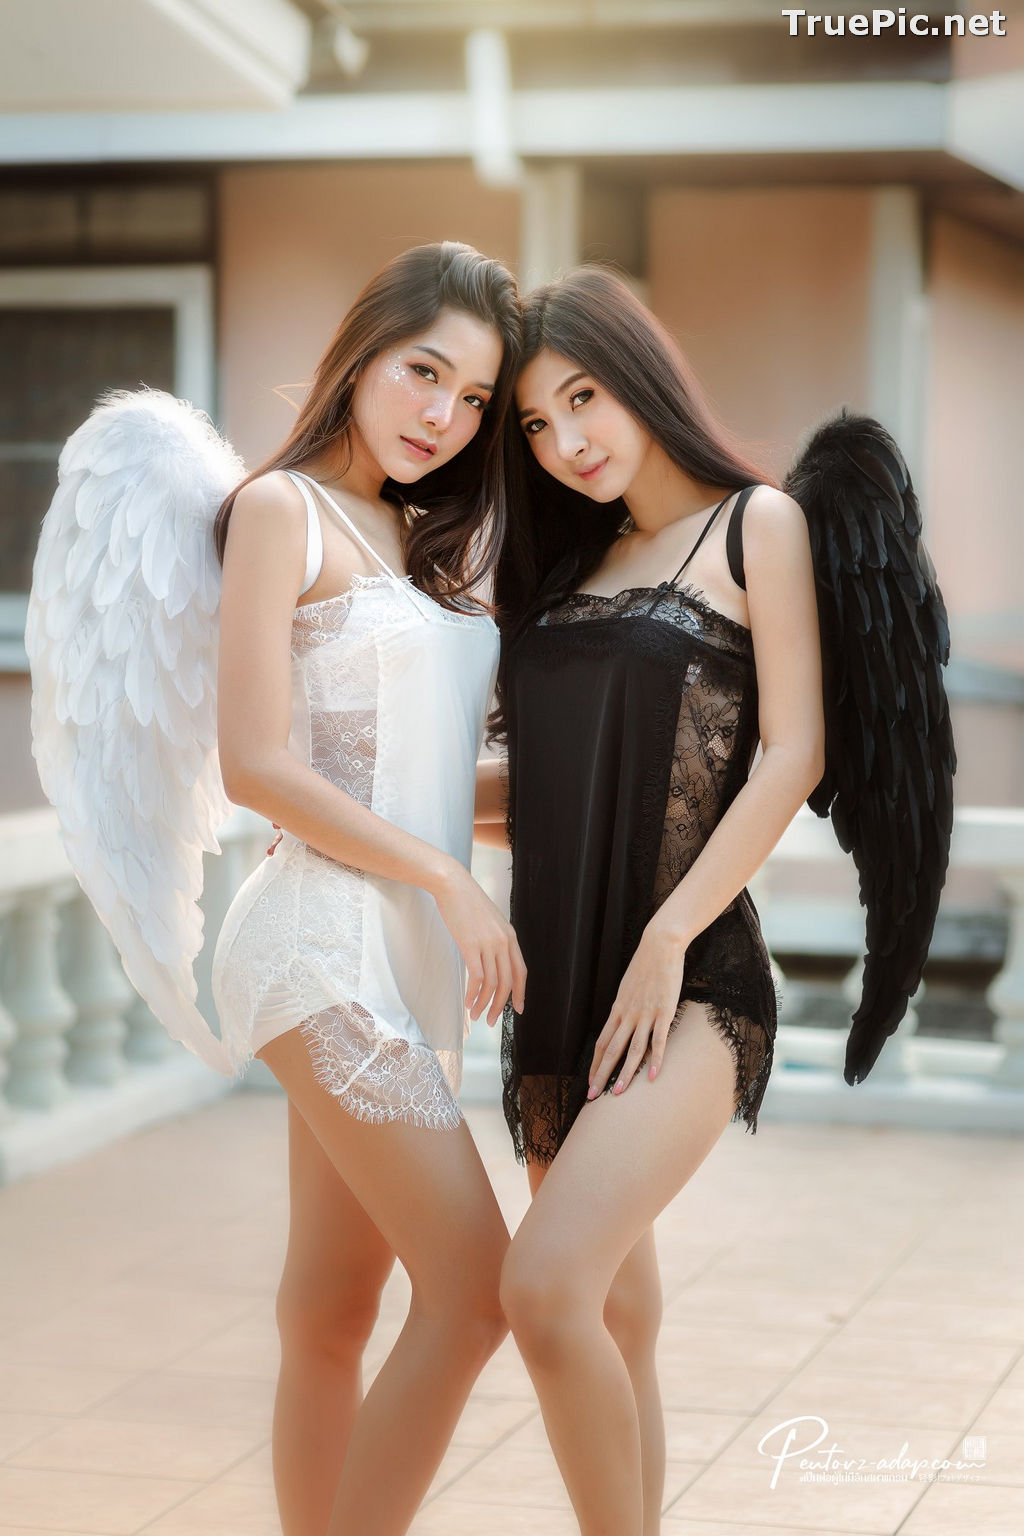 Image Thailand Model - Phitchamol Srijantanet and Pattamaporn Keawkum - Angel and Demon - TruePic.net - Picture-7